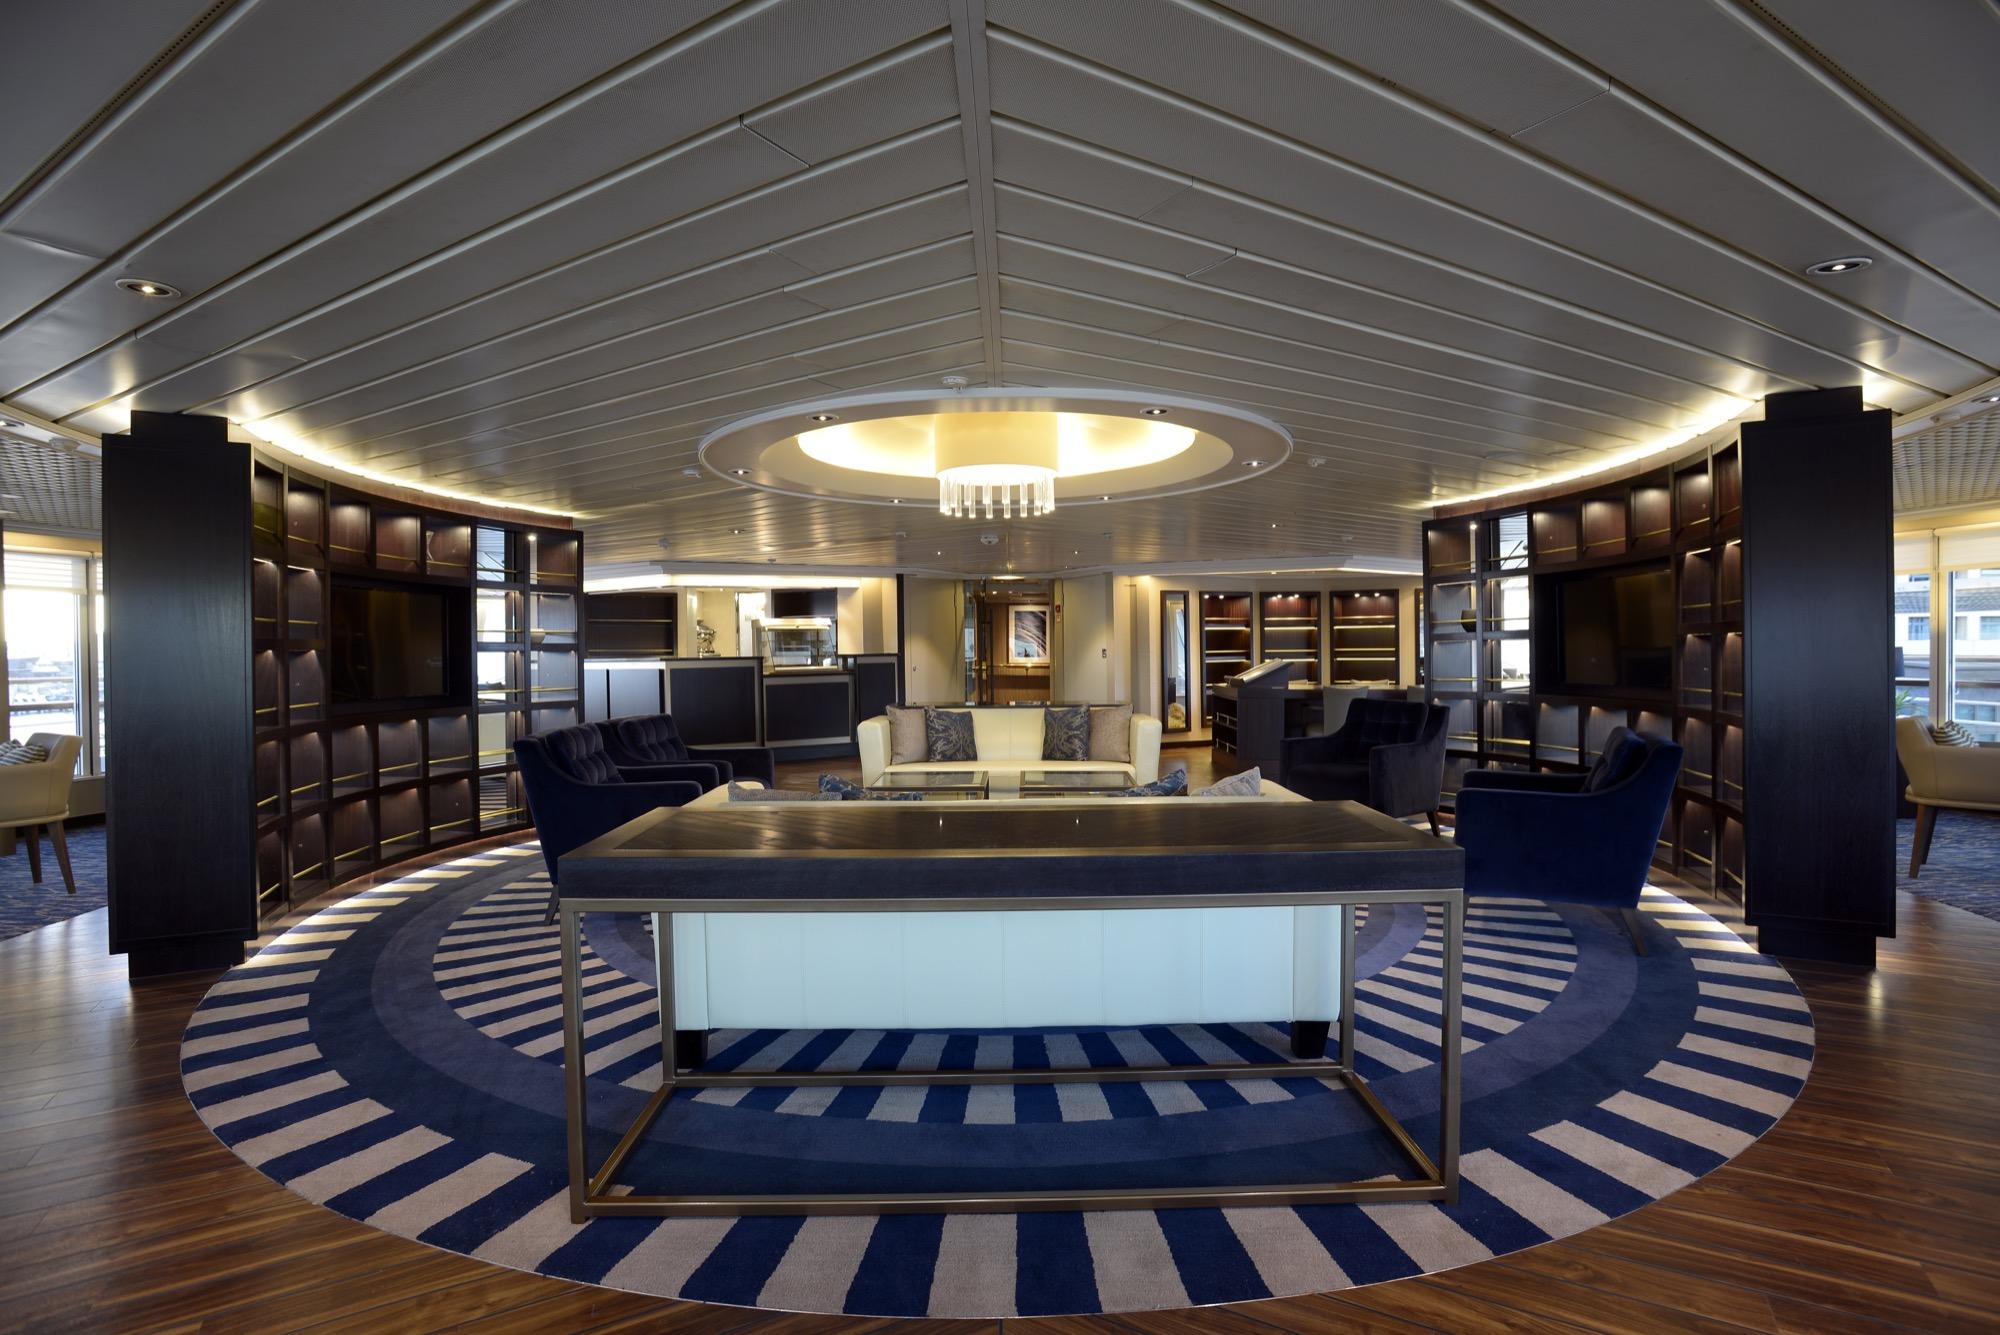 Windstar Star Pride Interior Yacht Club 16.jpg